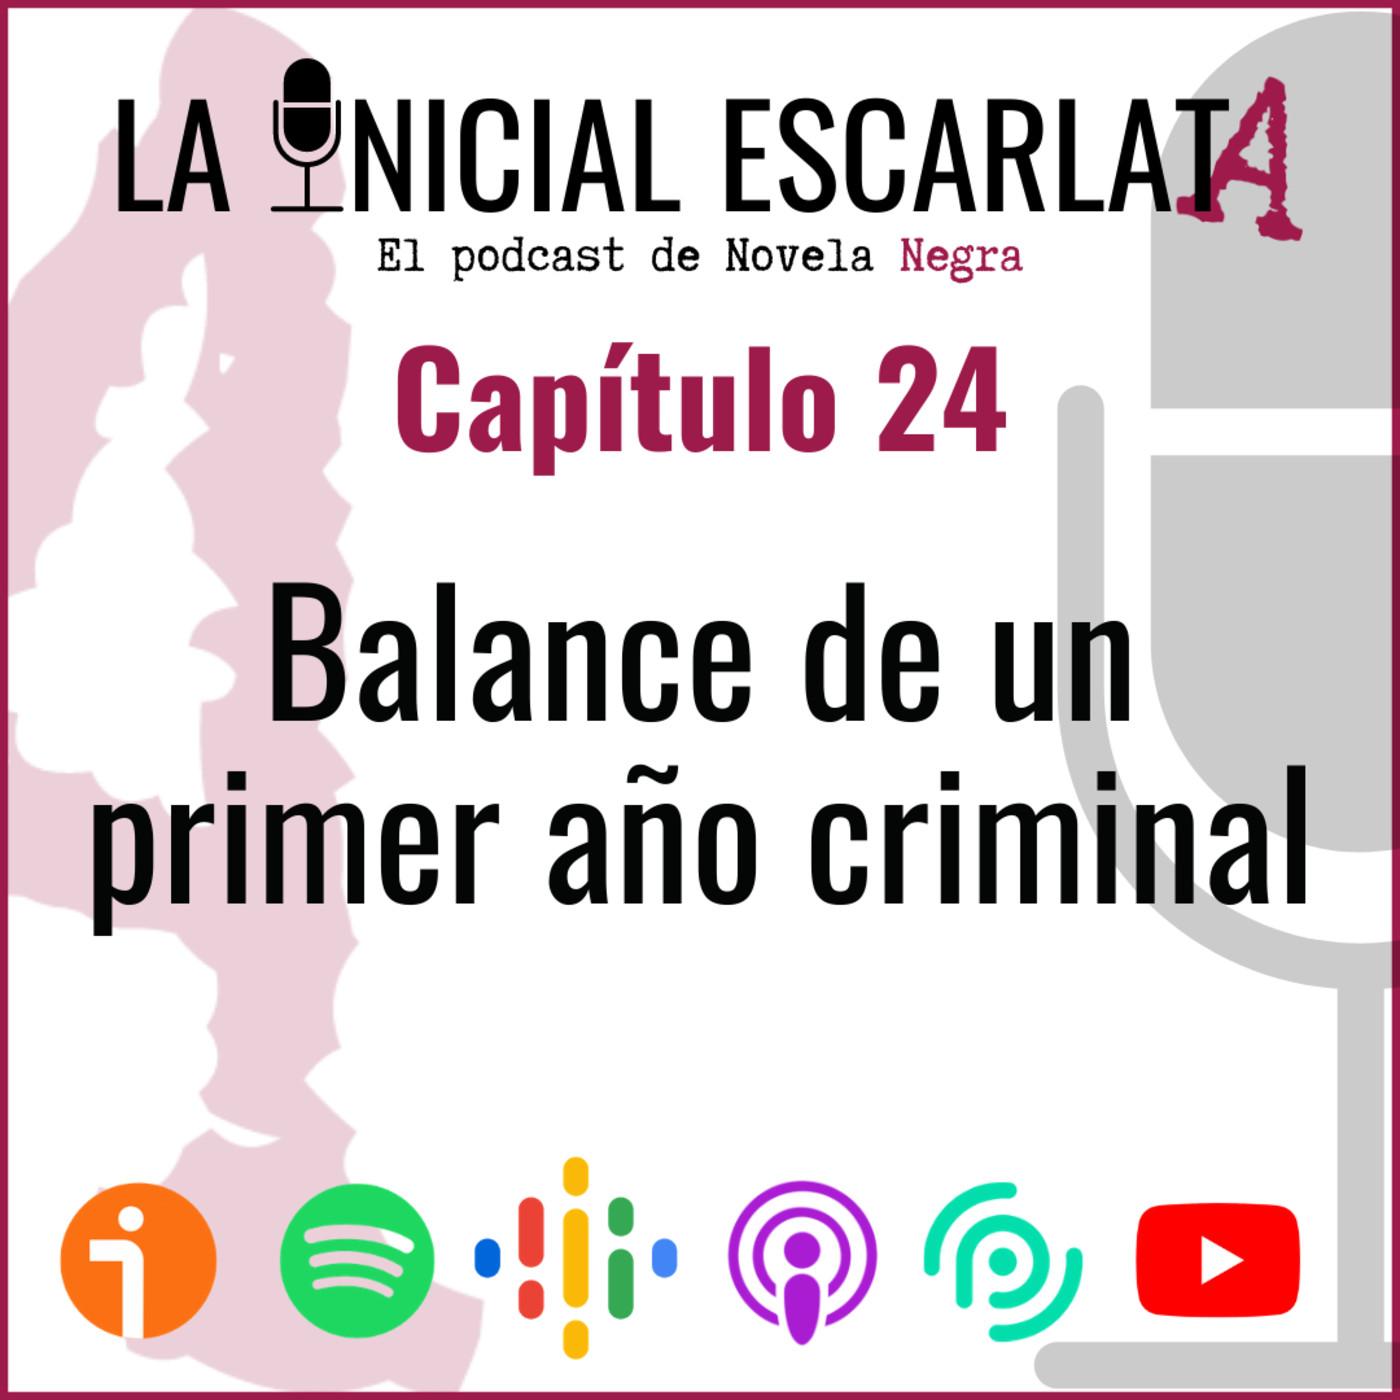 Capítulo 24: Balance de un primer año criminal